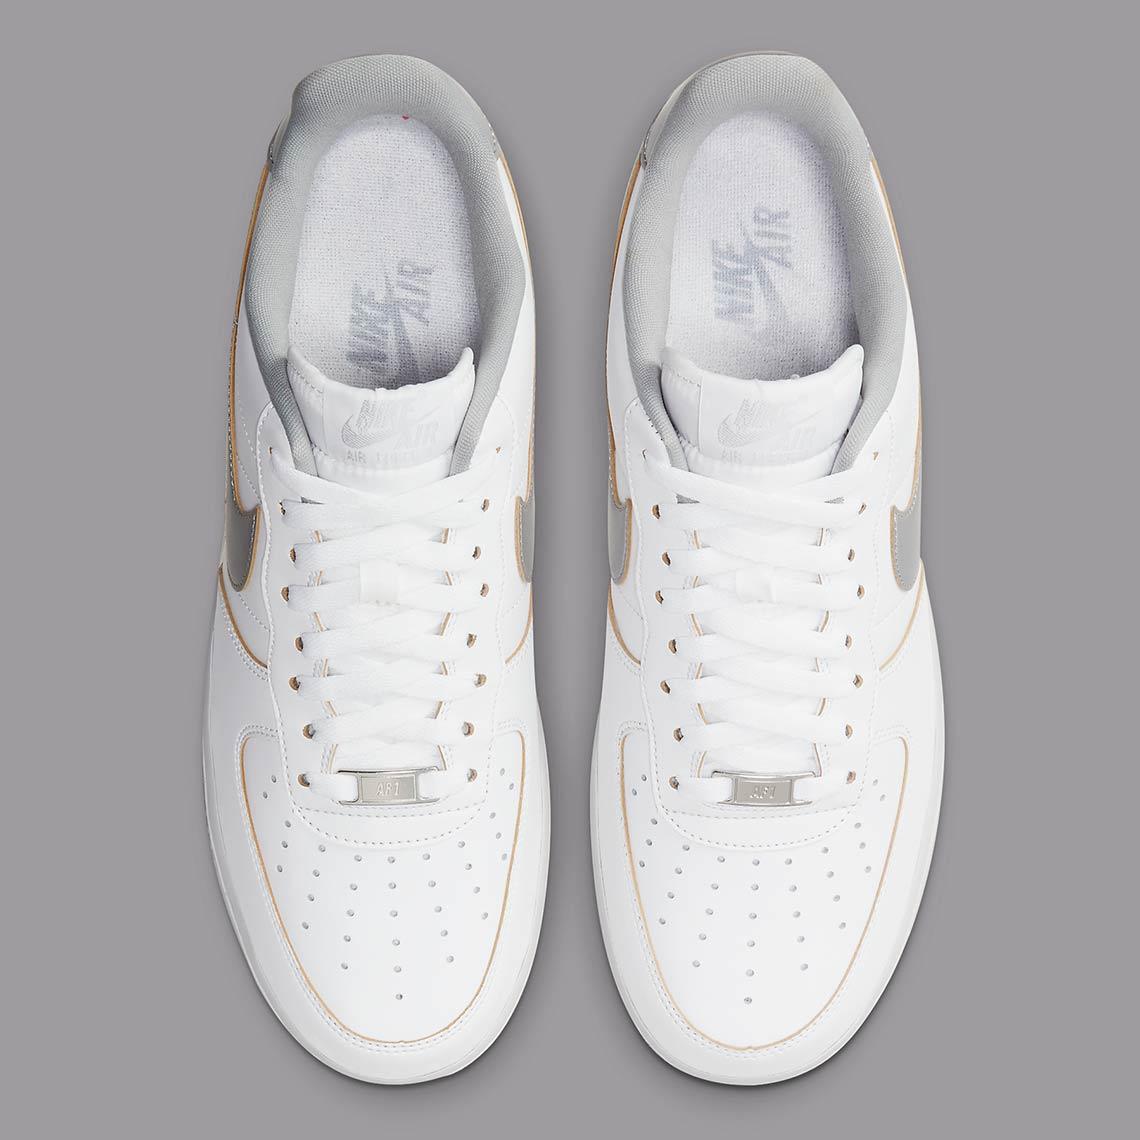 Nike Air Force 1 Low Label Maker DC5209